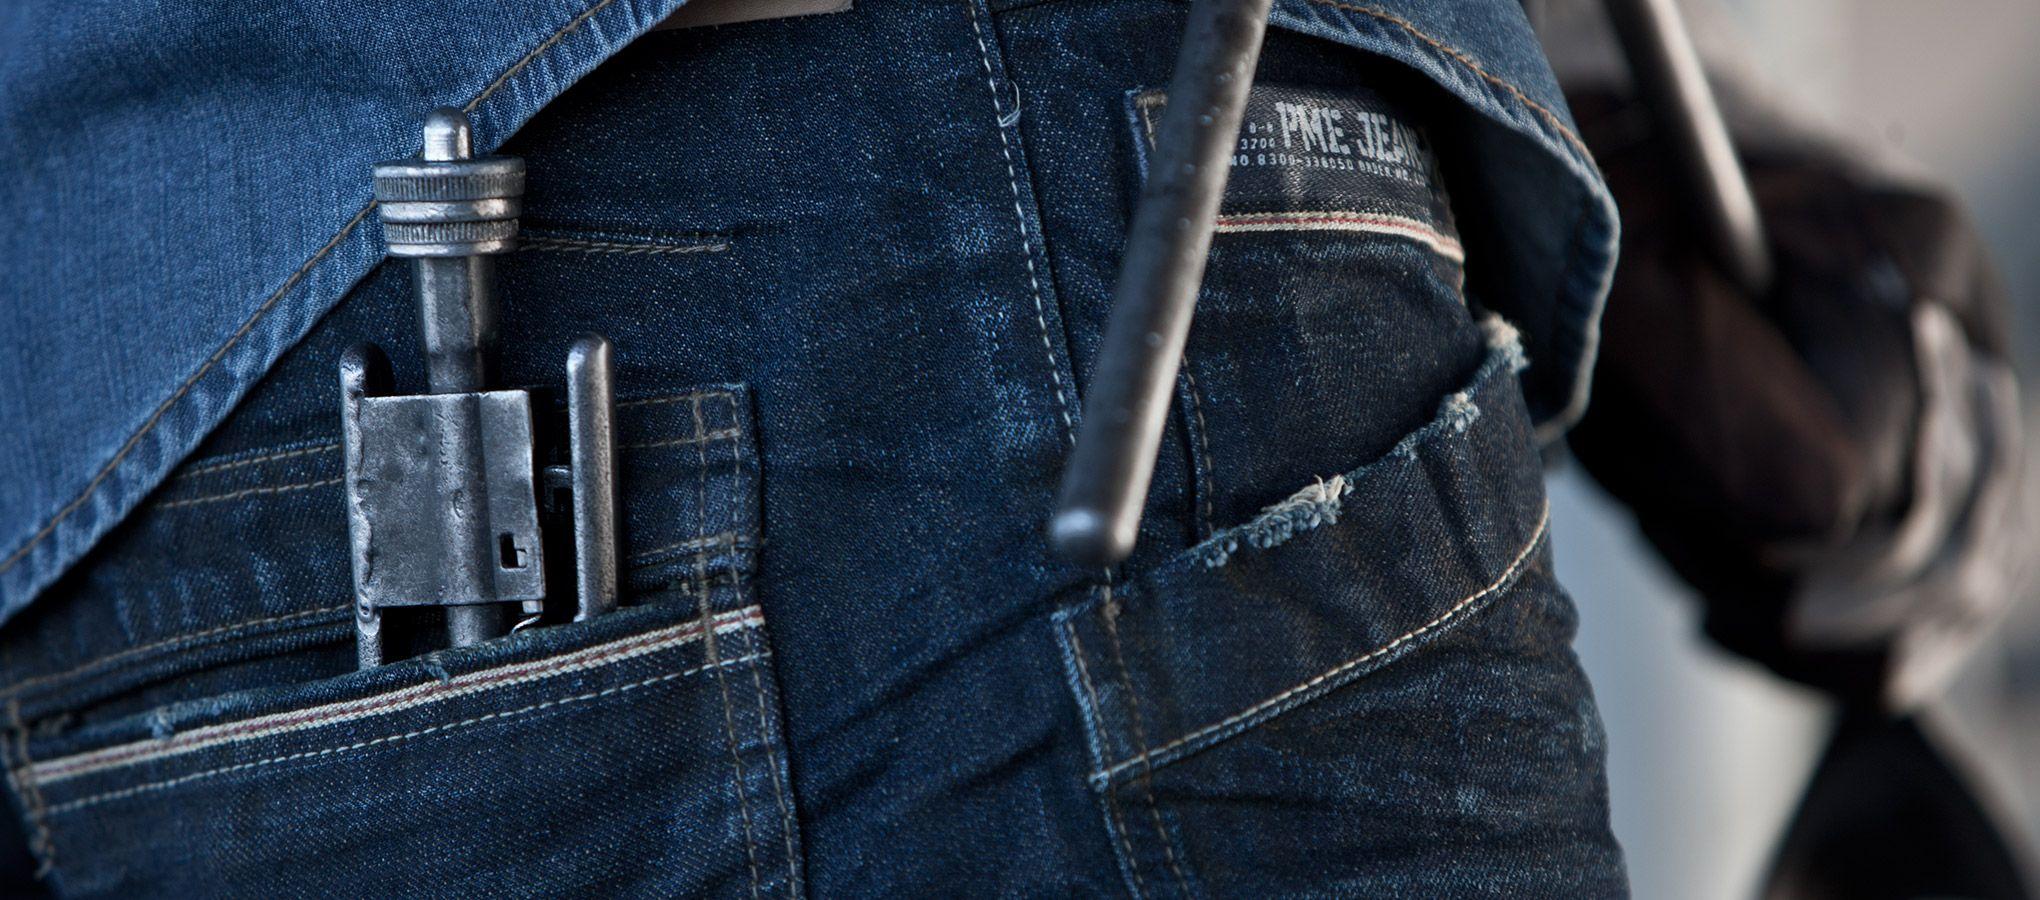 PME LEGEND - Jeans Collection